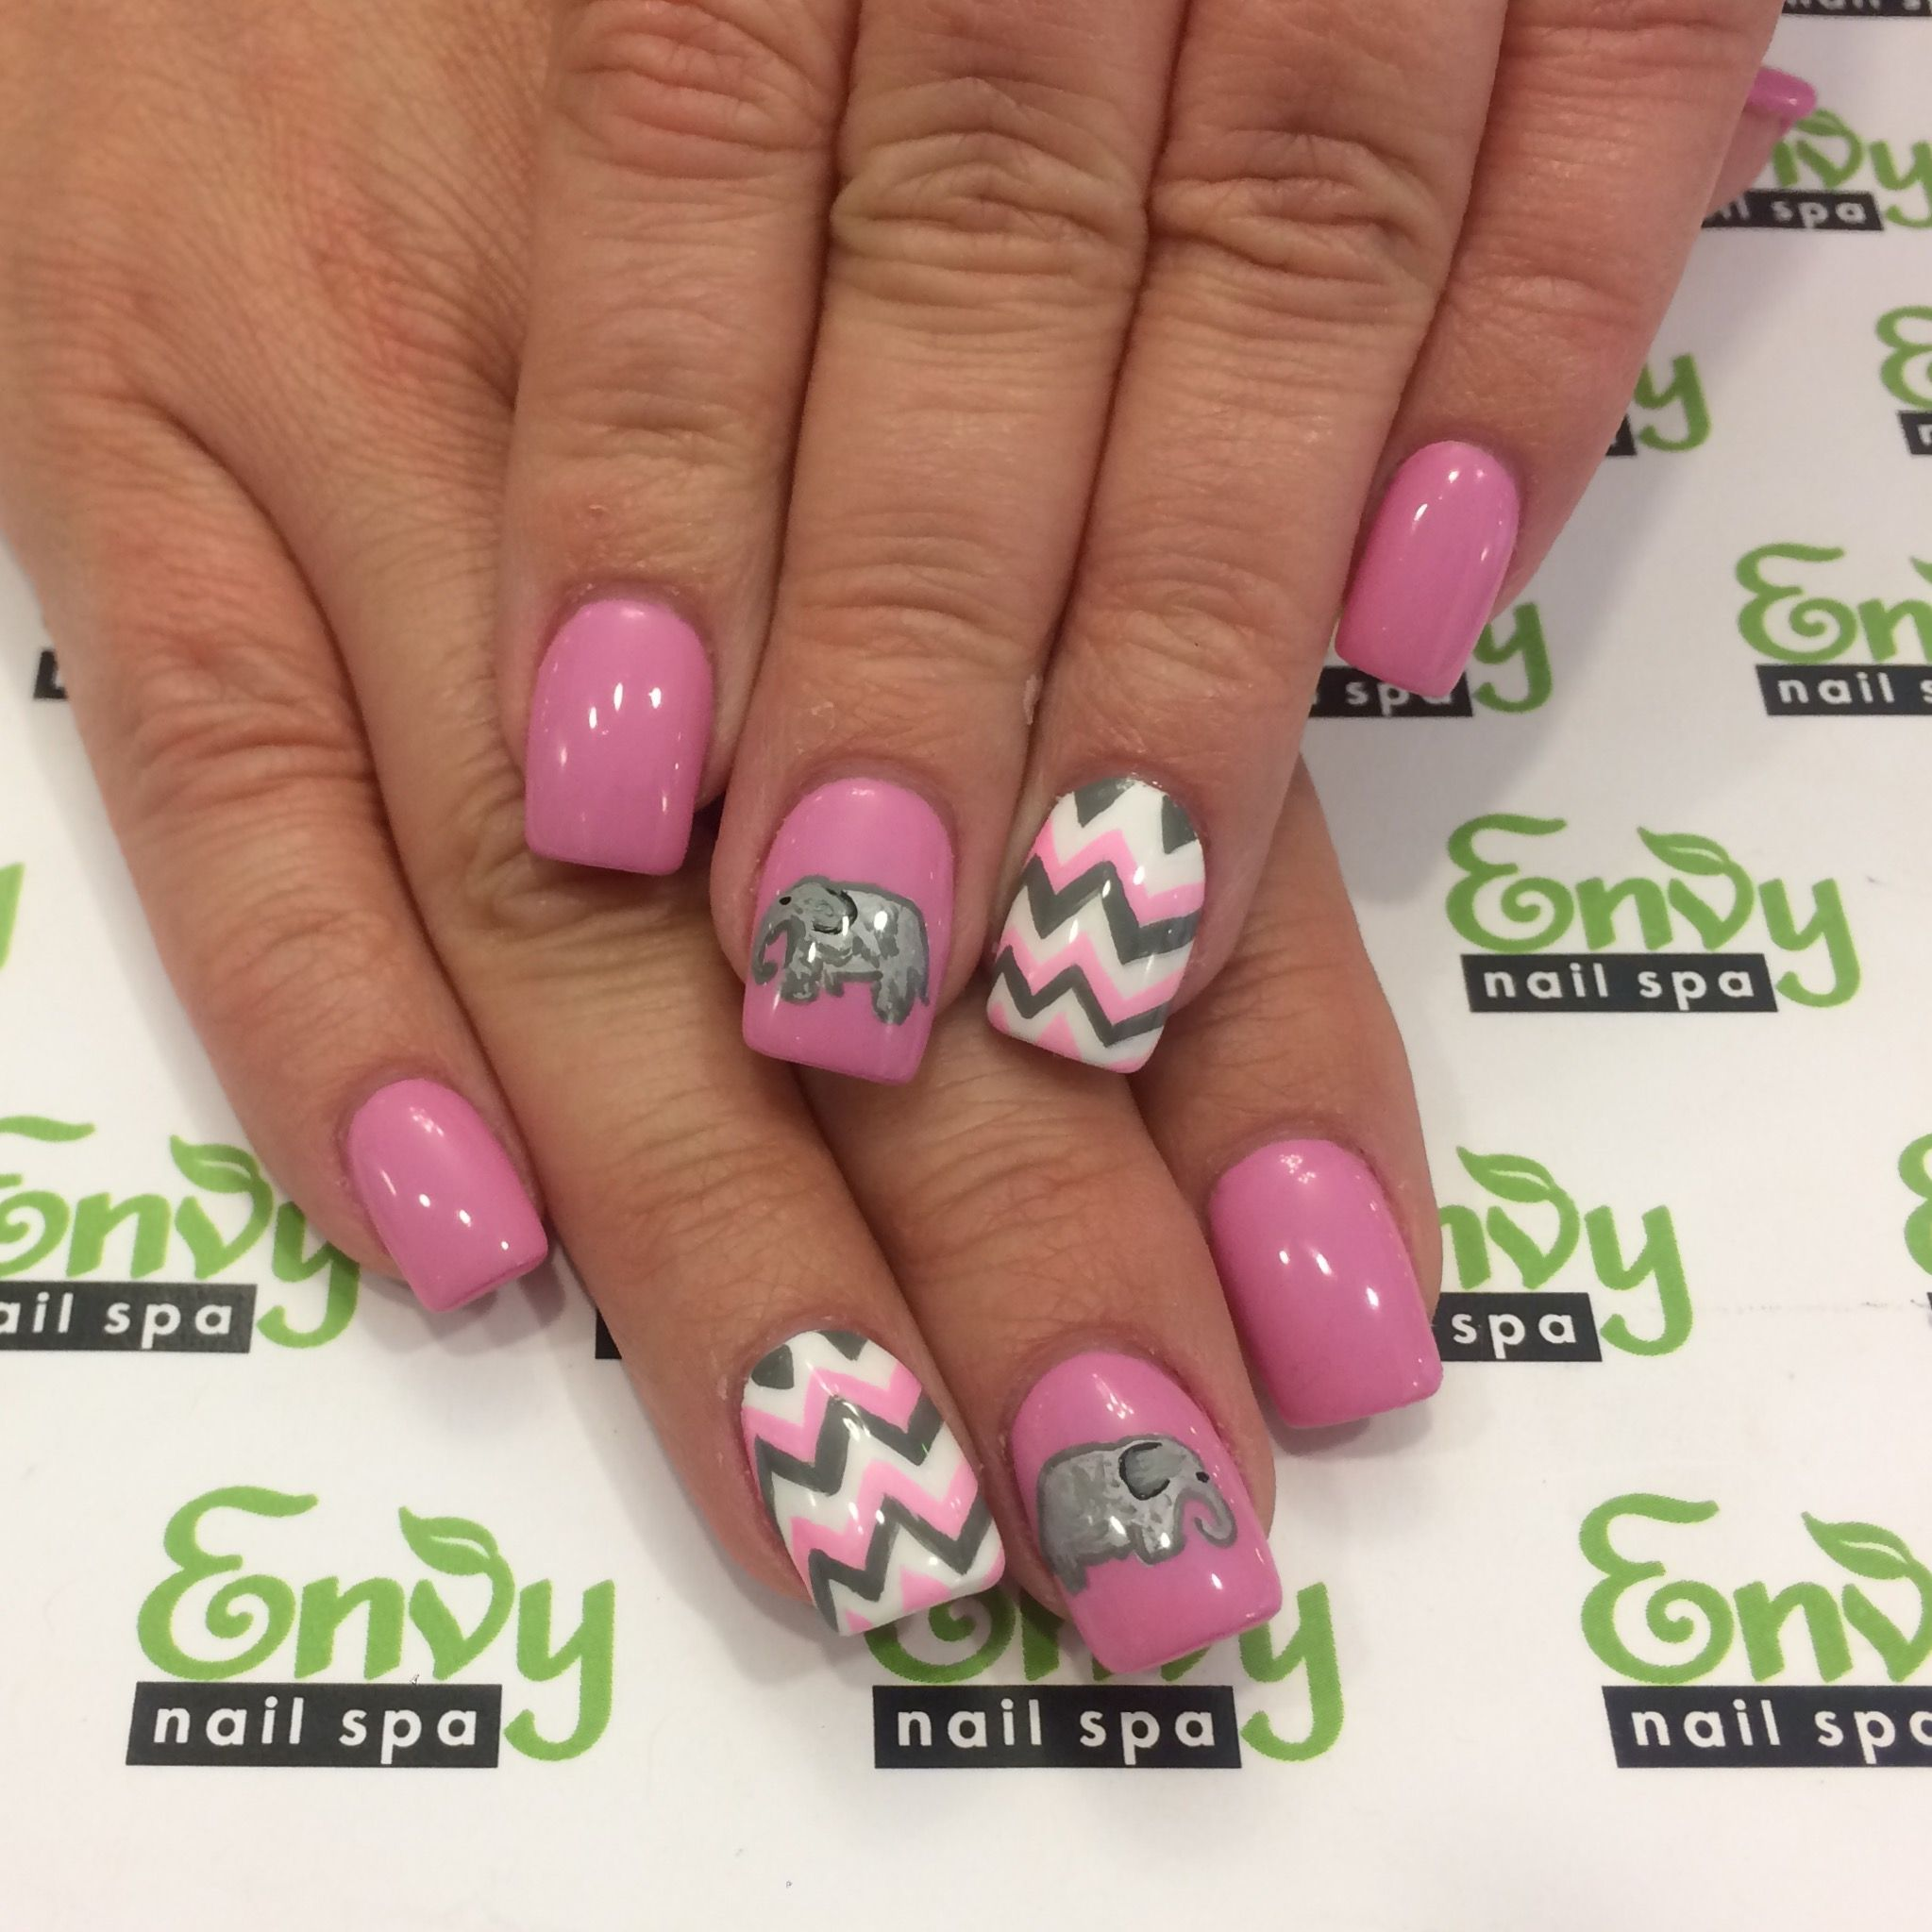 Elephant, Zigzag, Pink, White, Grey Nails - Envy Nail Spa | Misc ...